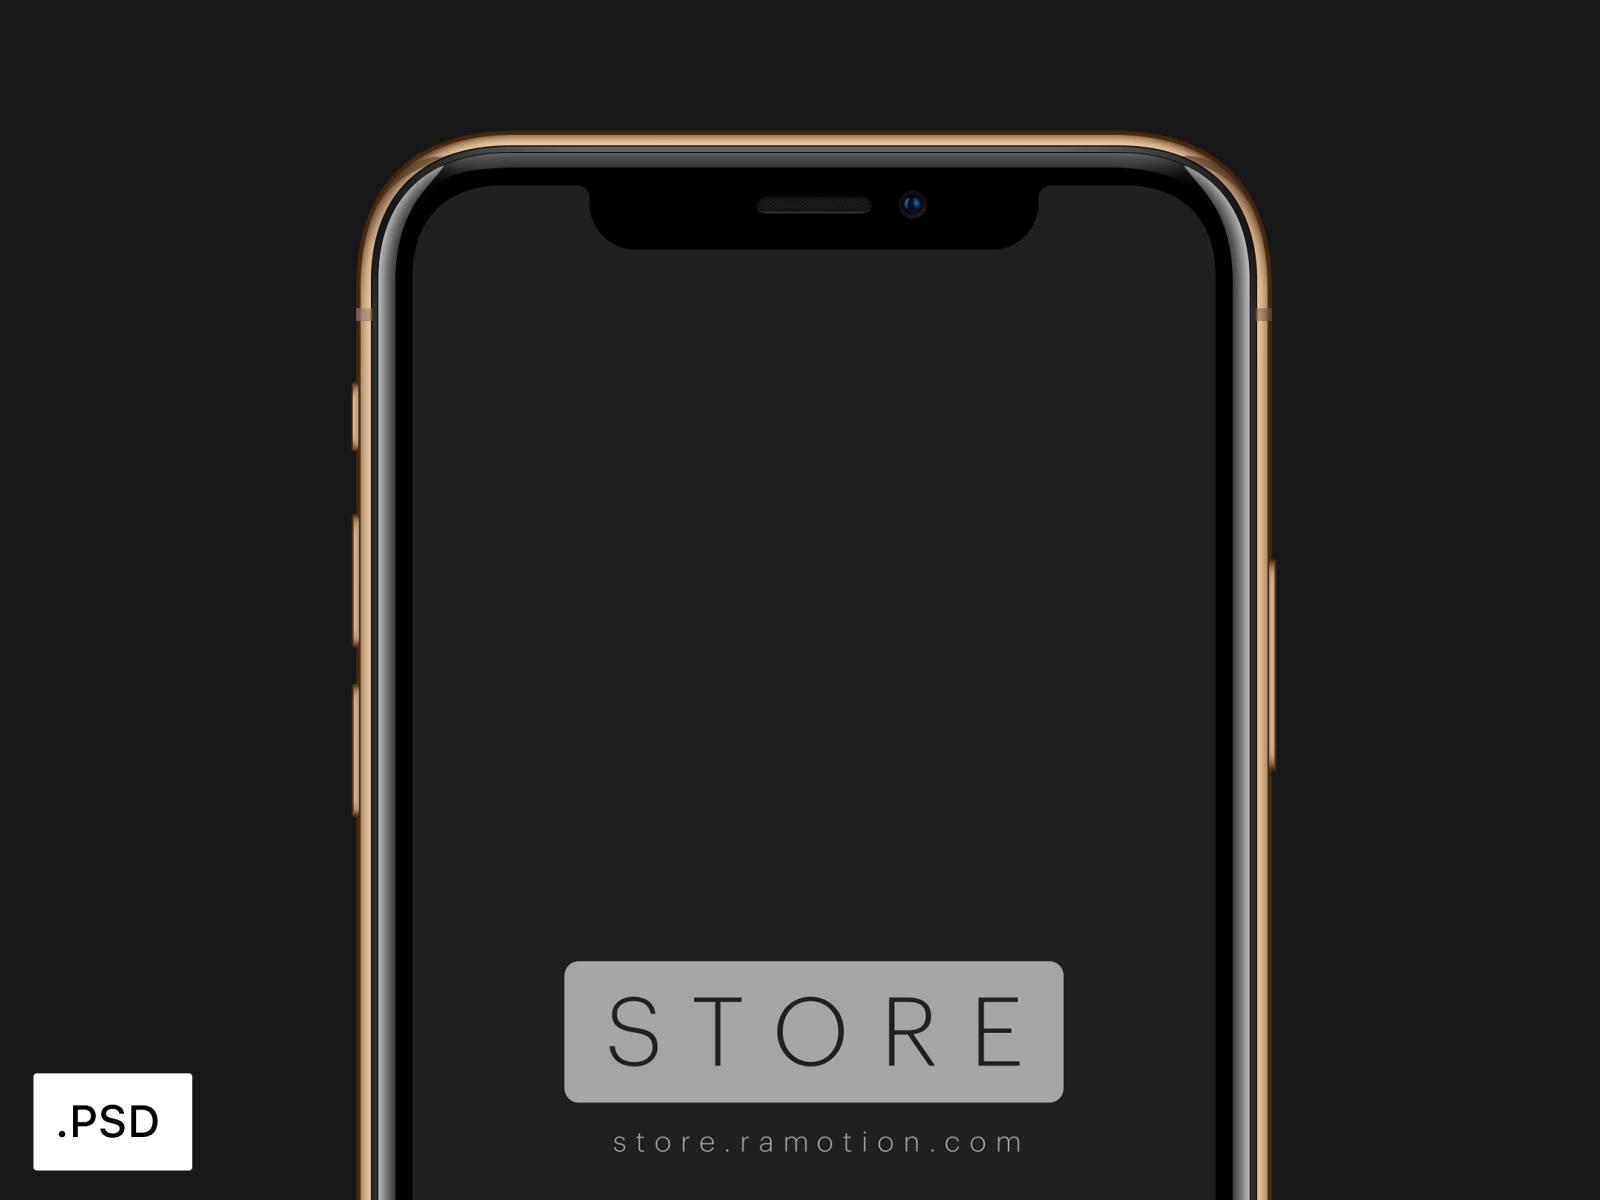 Iphone xs gold mockup